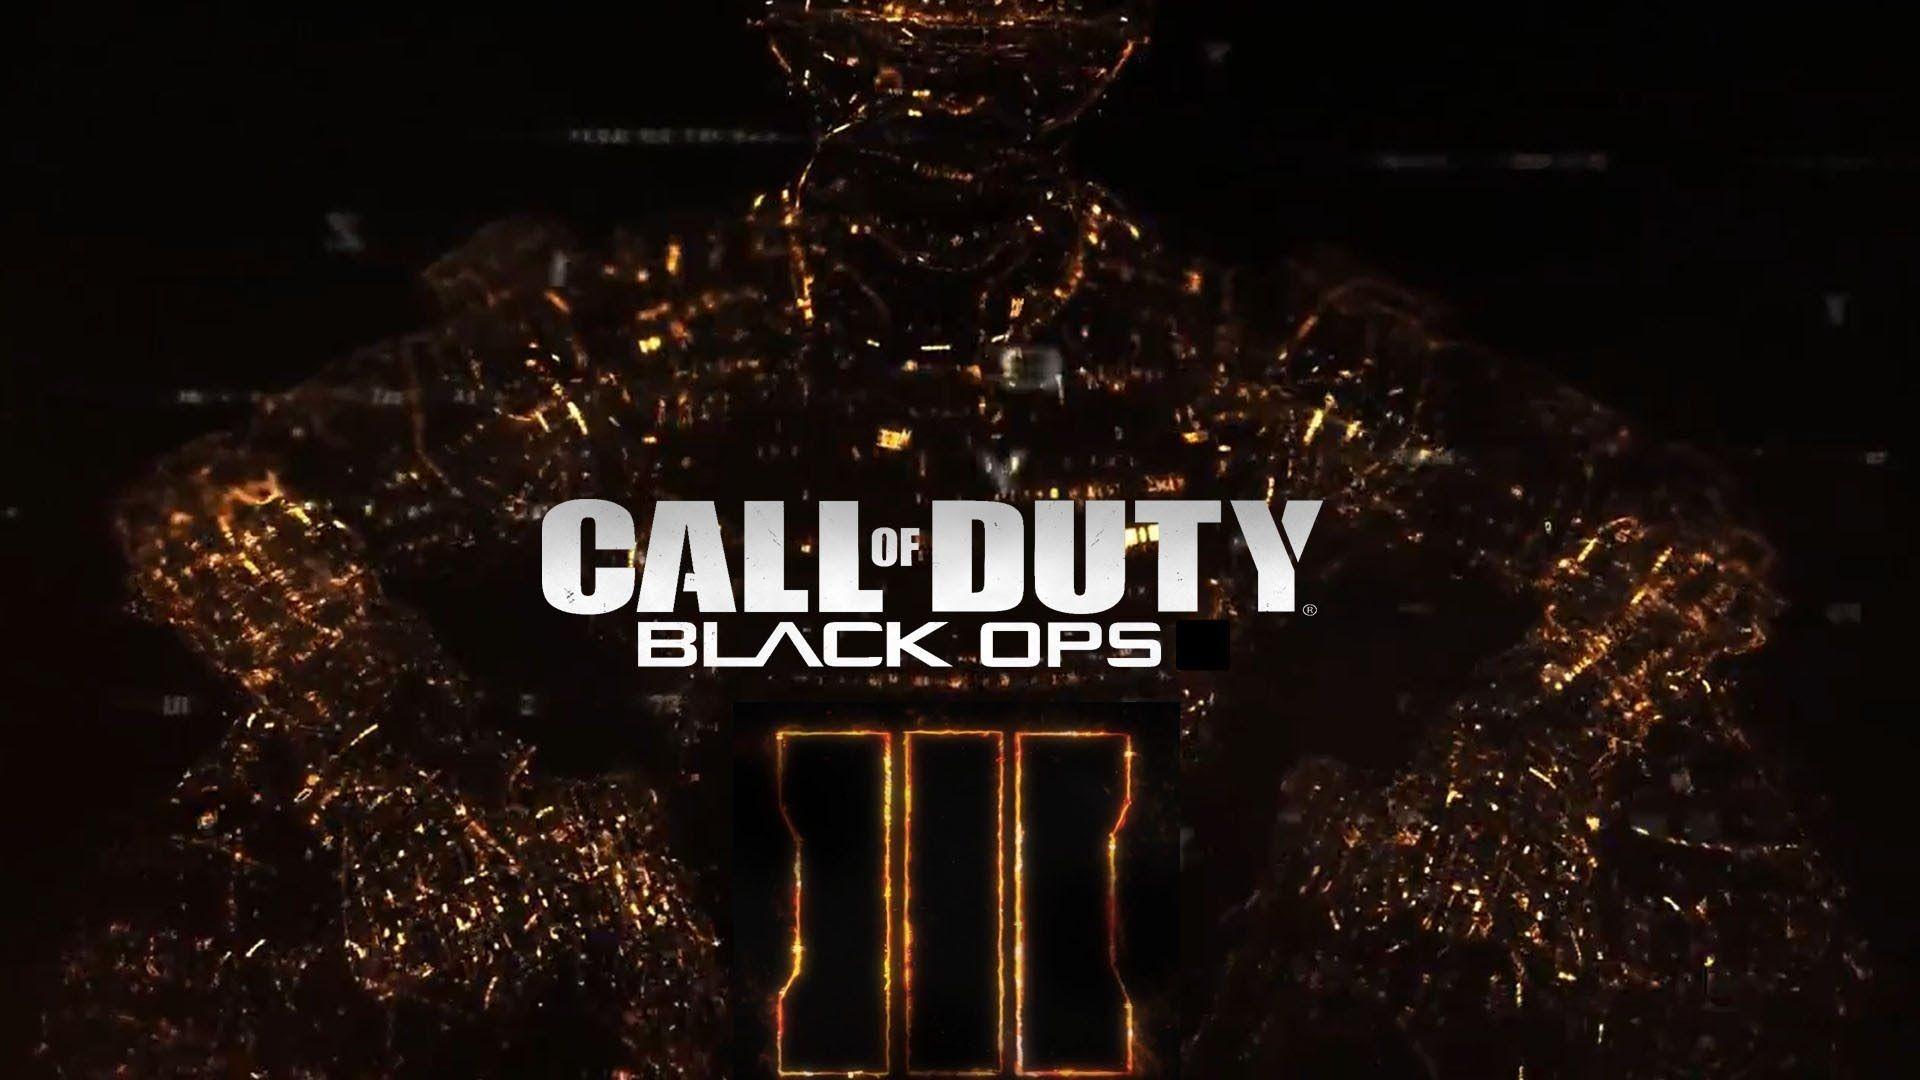 Full HD Call of Duty Black Ops III Wallpaper